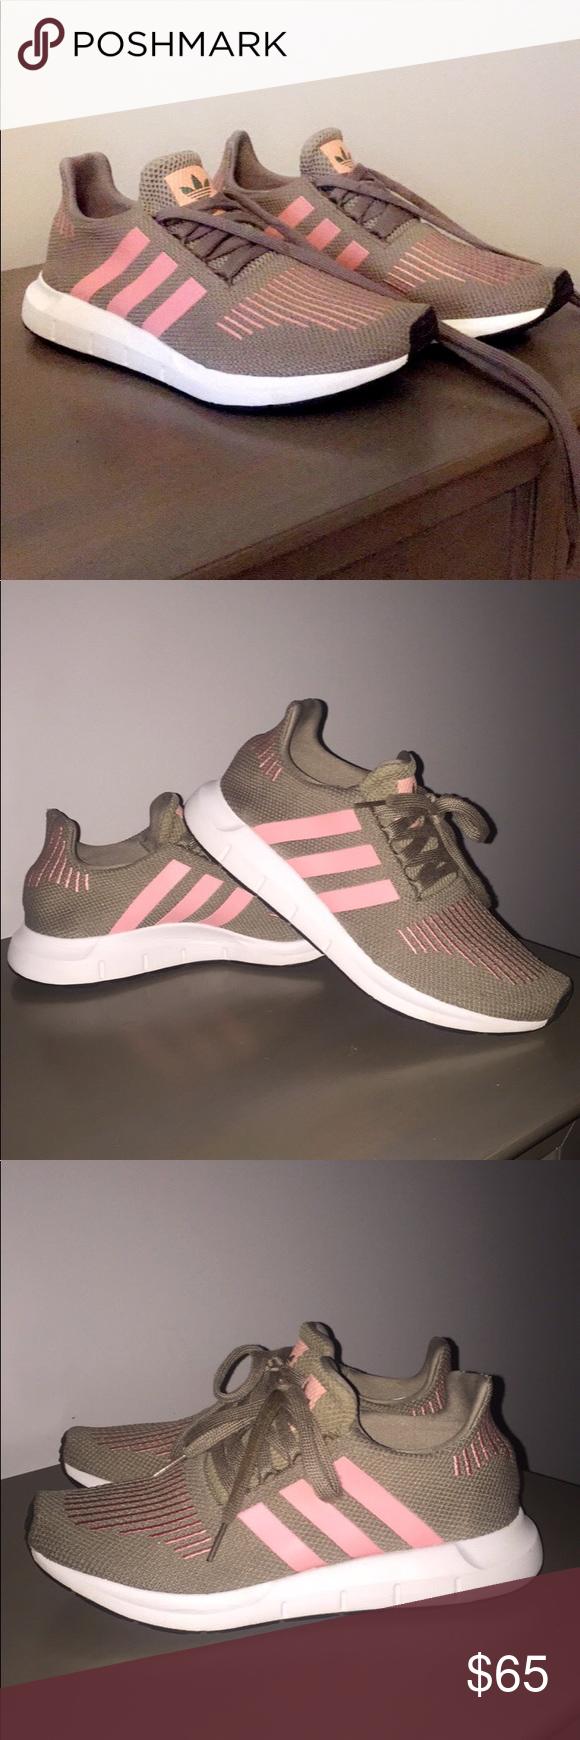 adidas swift run le scarpe adidas, verde militare e adidas